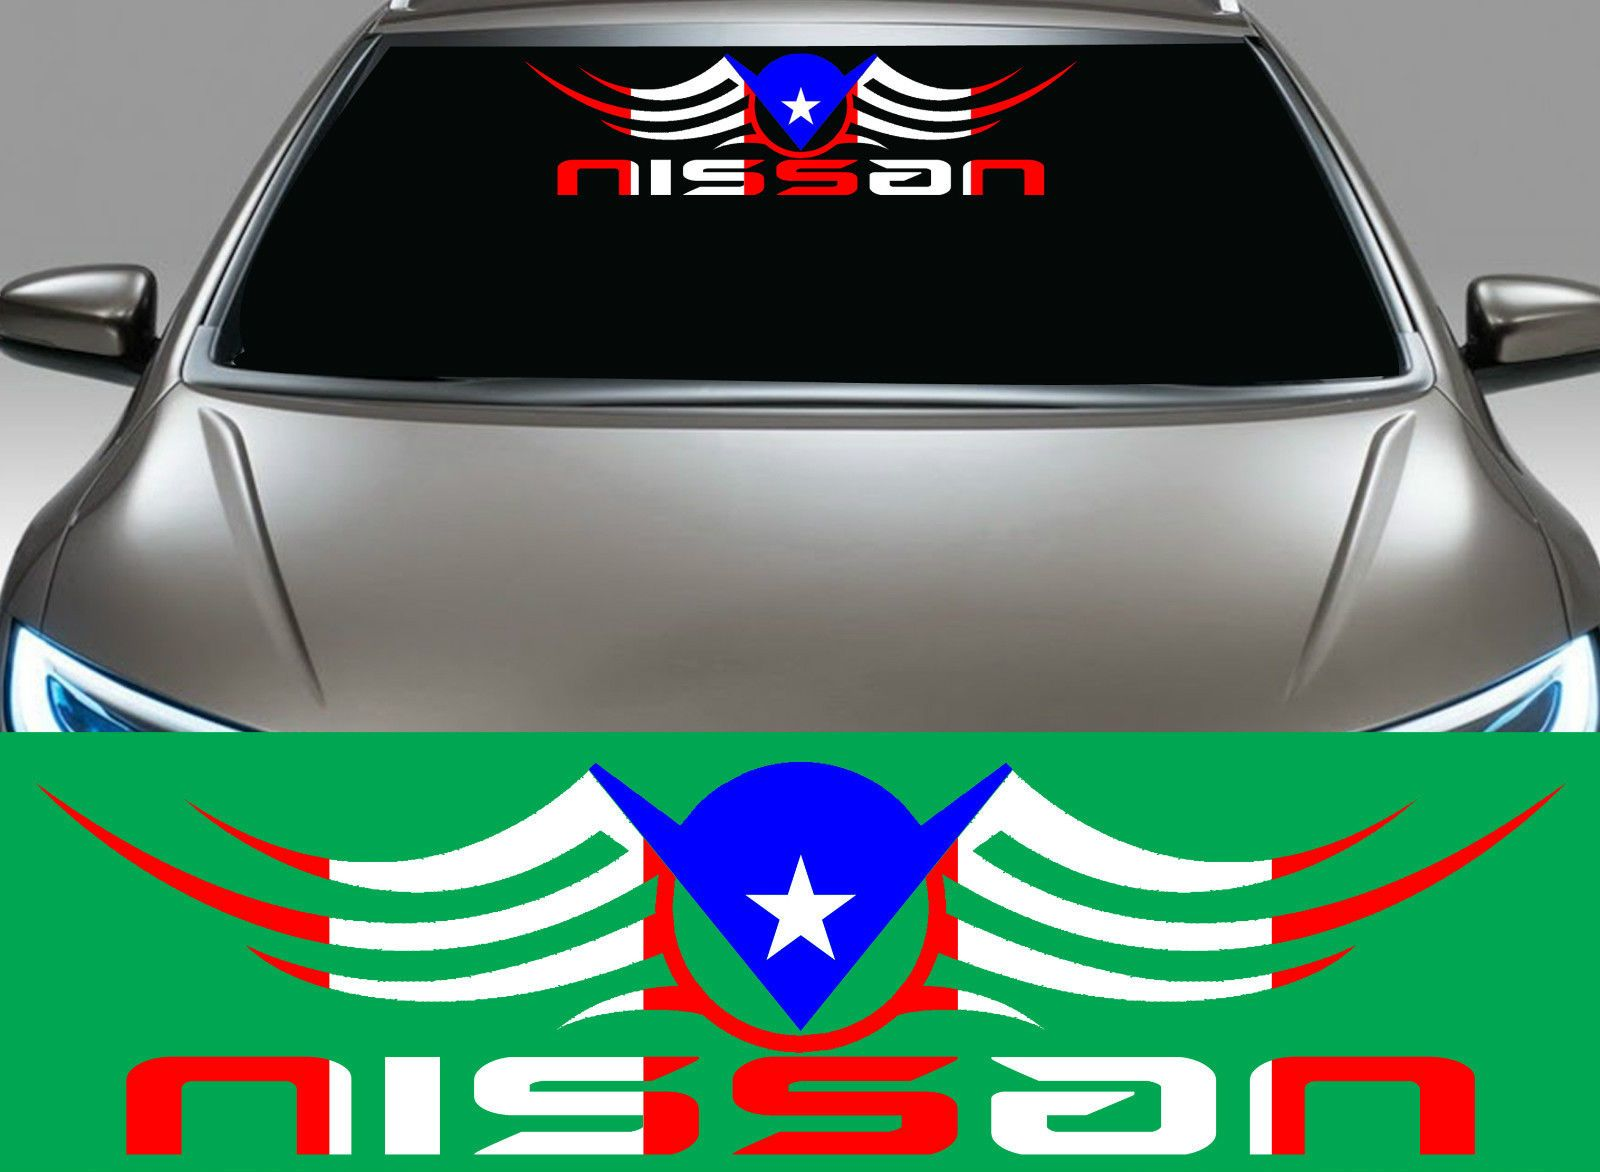 1 Puerto Rico Puerto Rican Flag Car Decal Vinyl Stickers 5379 Car Decals Vinyl Puerto Rican Flag Vinyl Sticker [ 1172 x 1600 Pixel ]